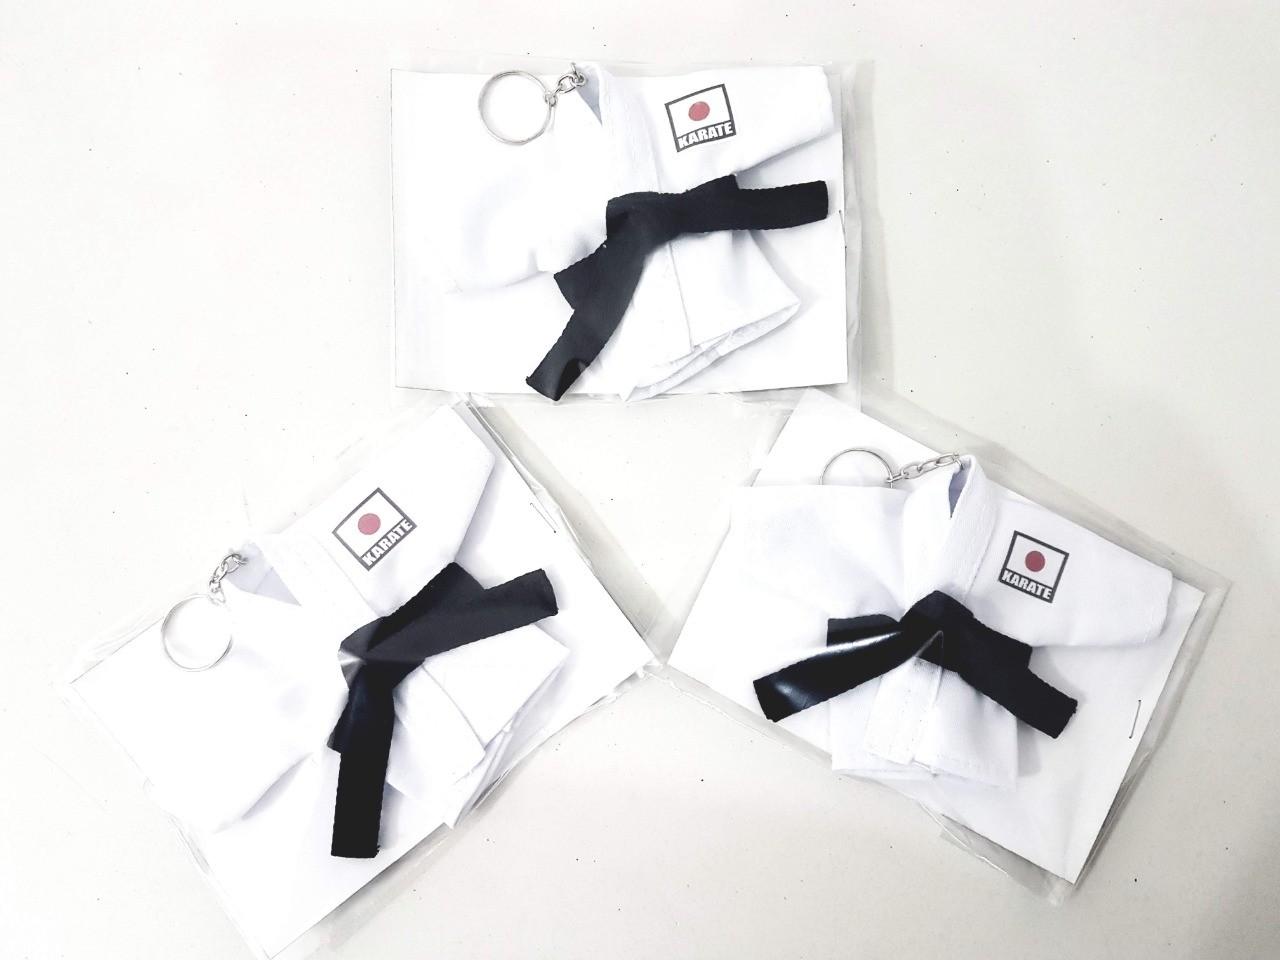 Mini Kimoninho Karate Japao Do Combo 3 unidades